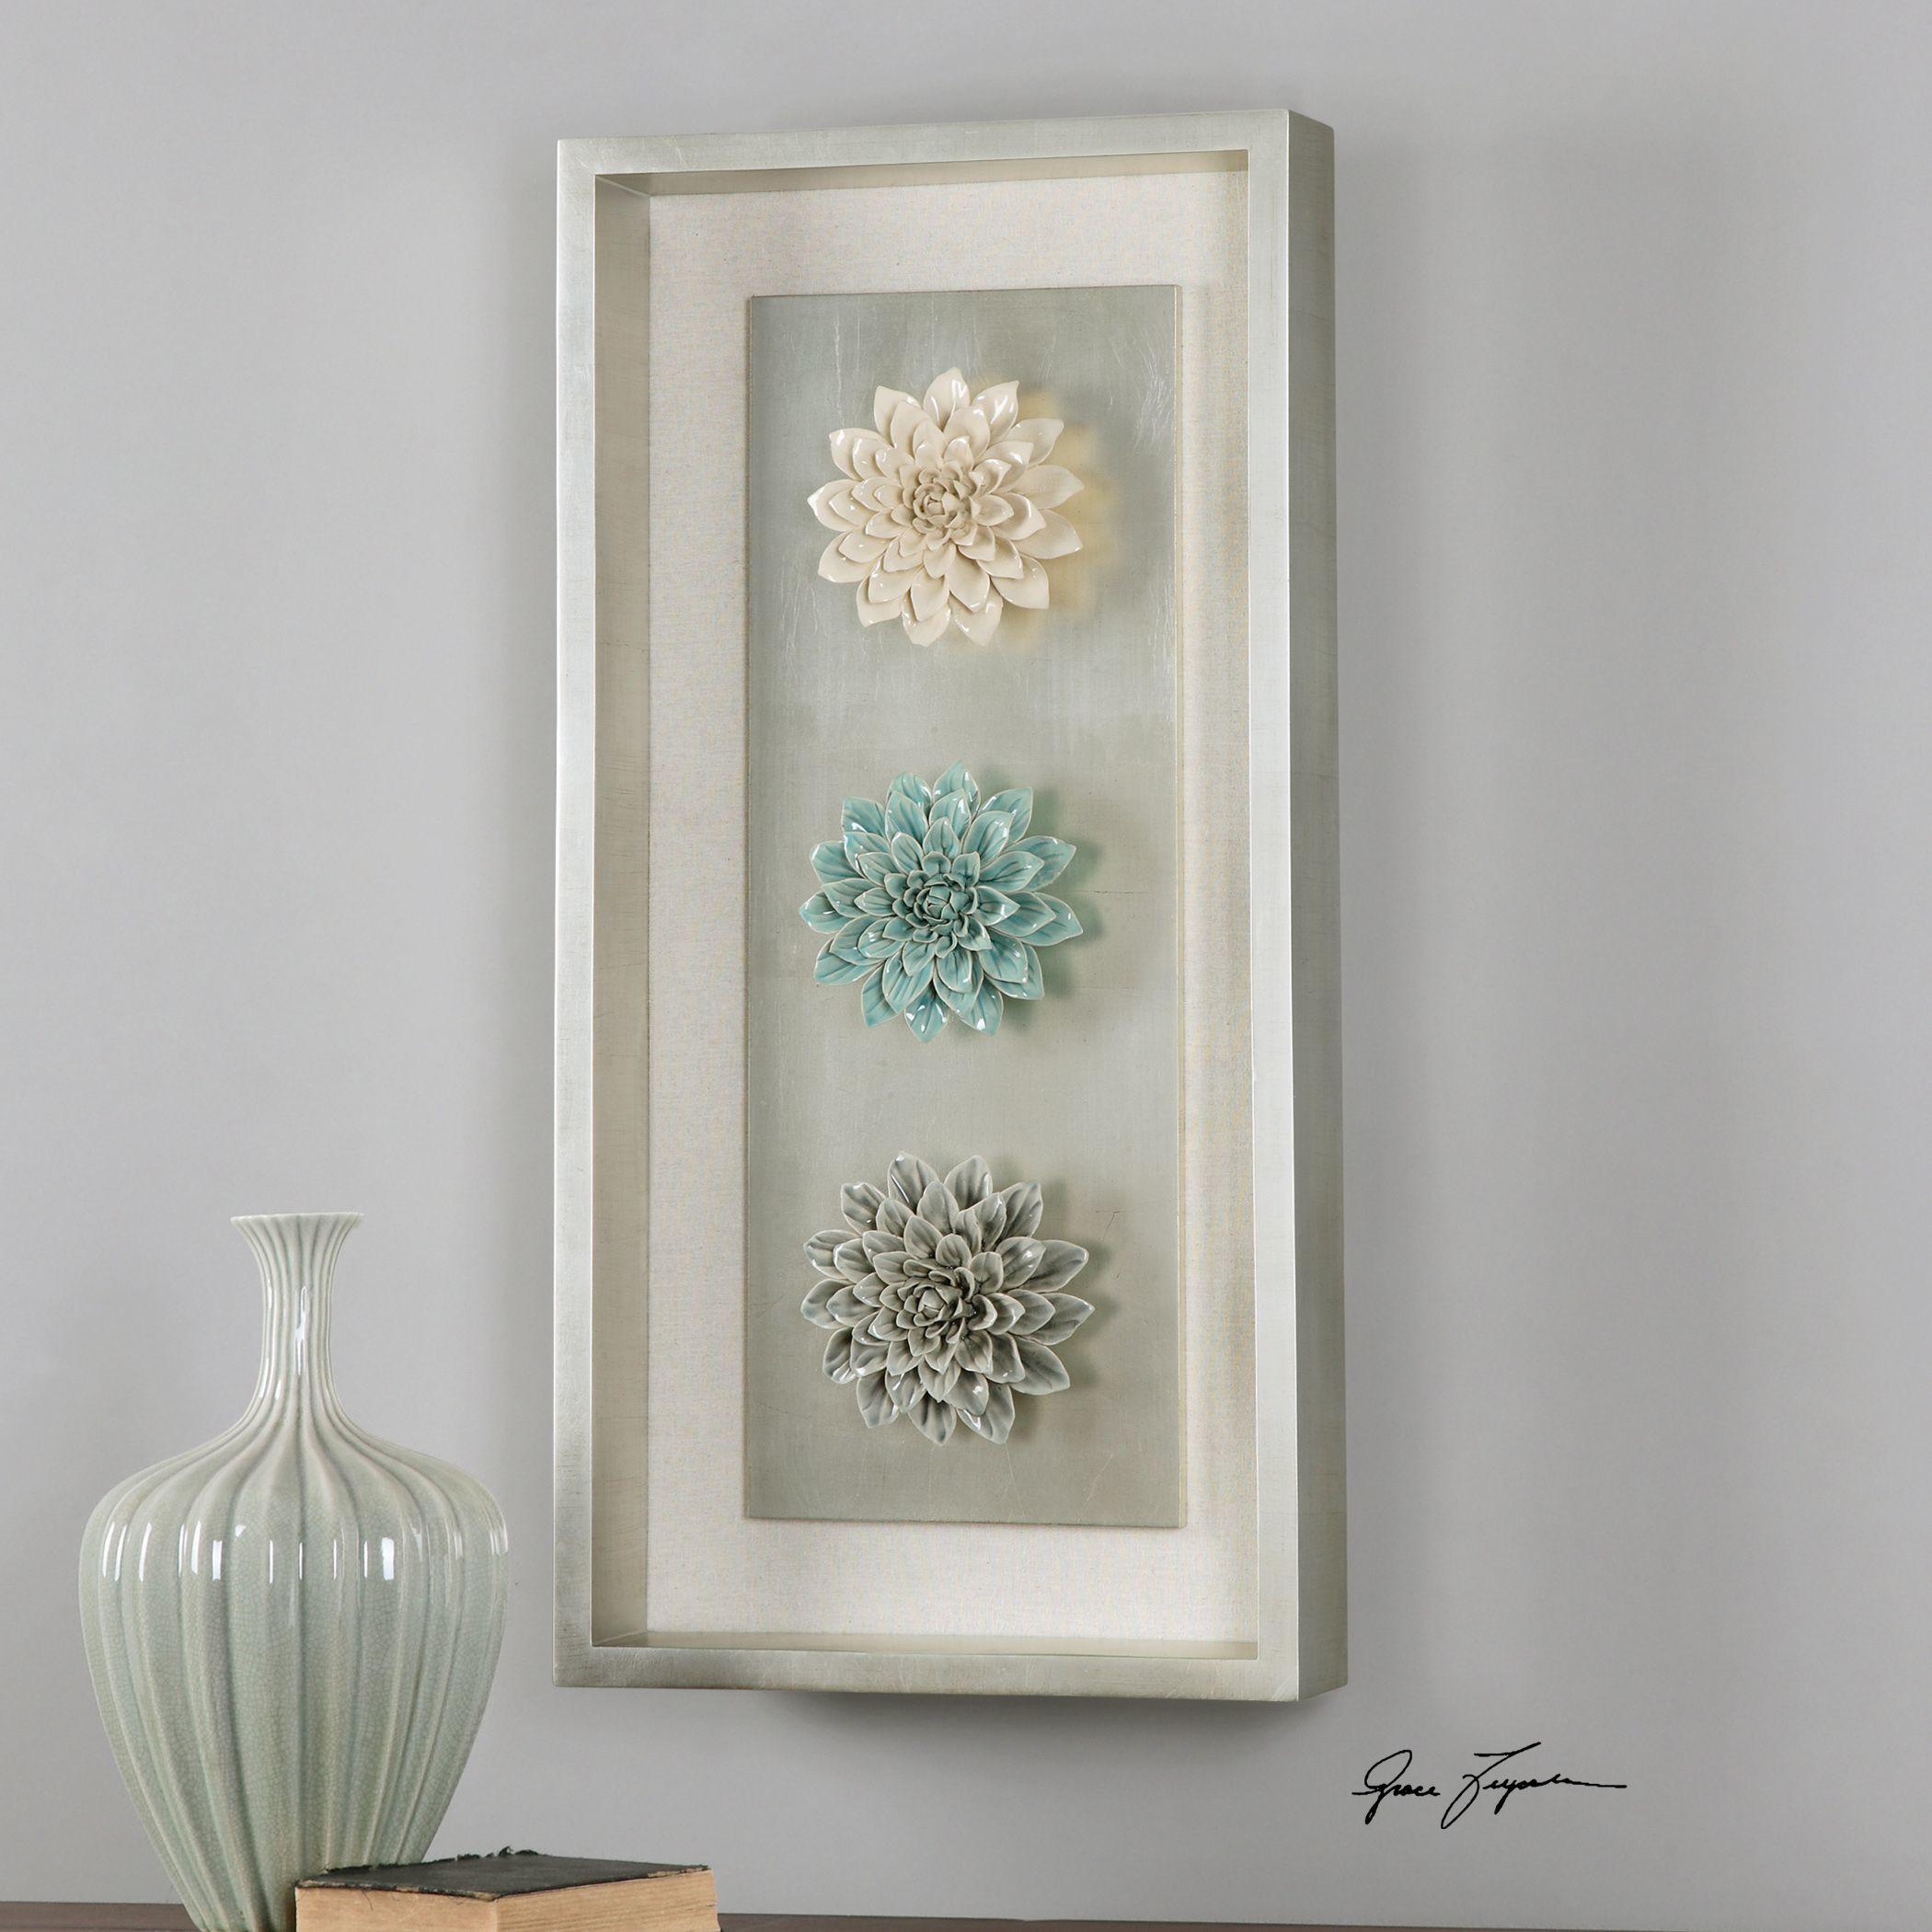 Best ideas about Wayfair Wall Art . Save or Pin Uttermost Florenza Framed Wall Decor & Reviews Now.